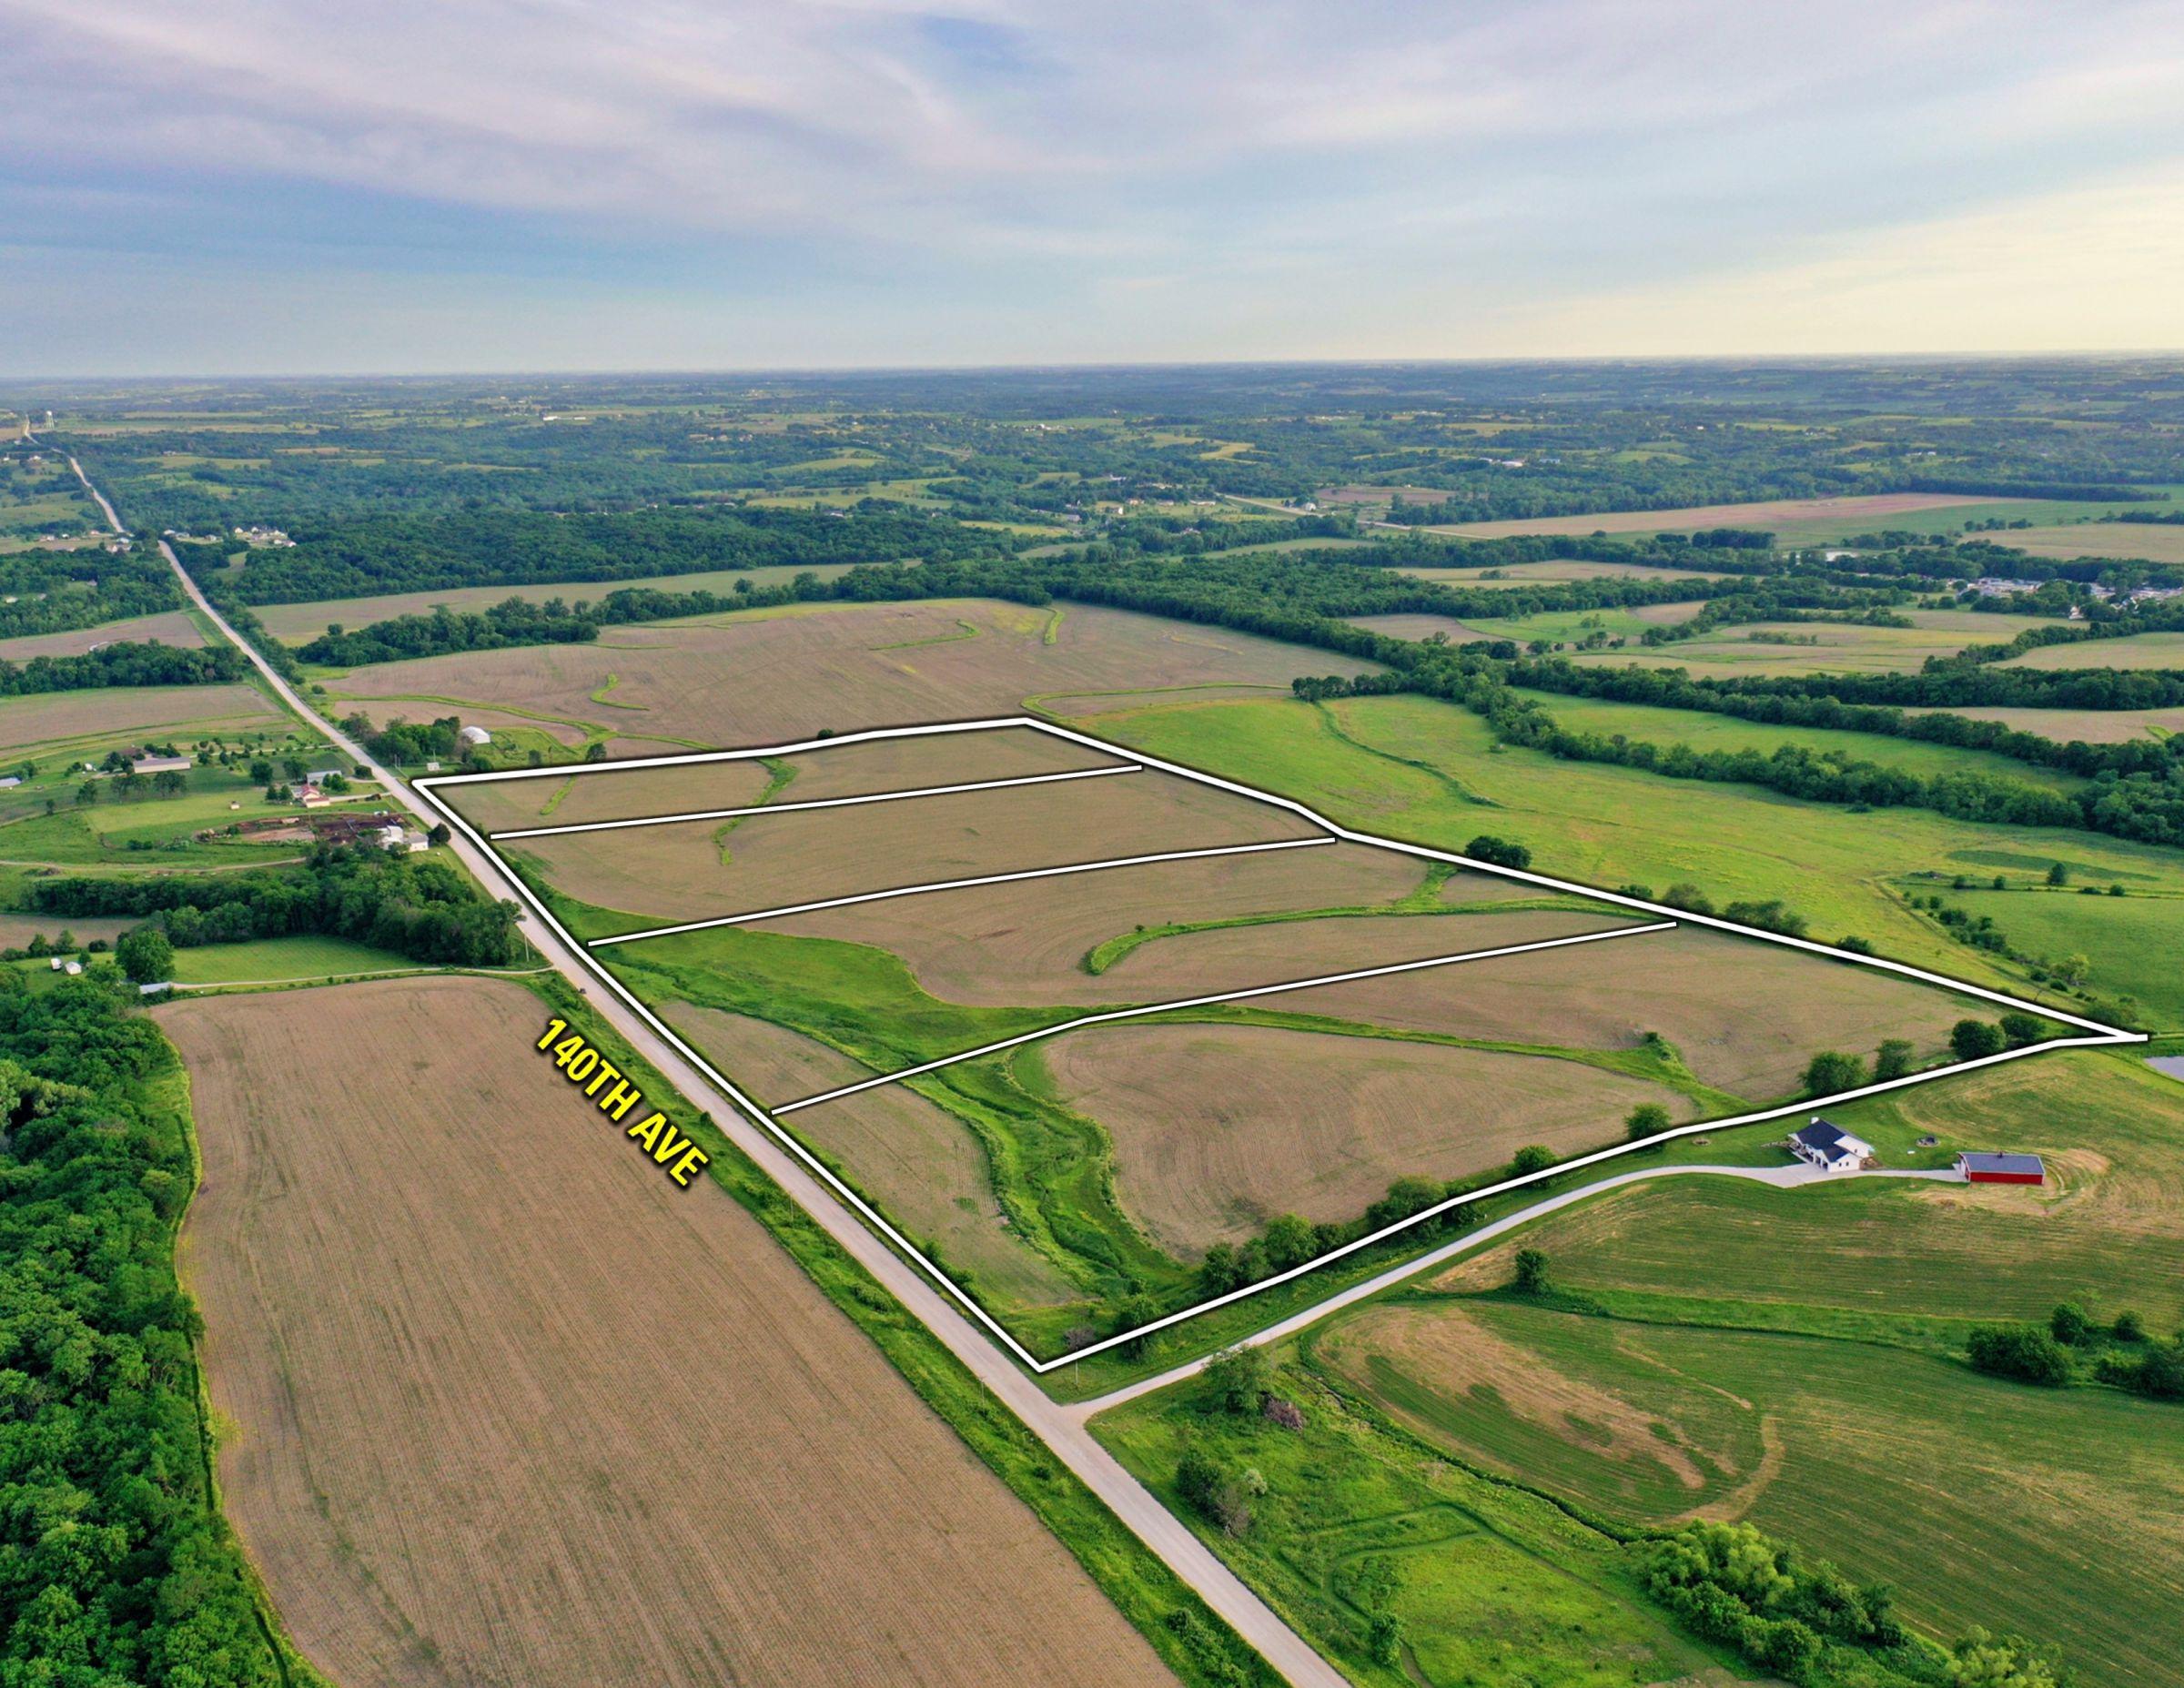 development-land-warren-county-iowa-20-acres-listing-number-15423-0-2021-03-26-184714.jpg